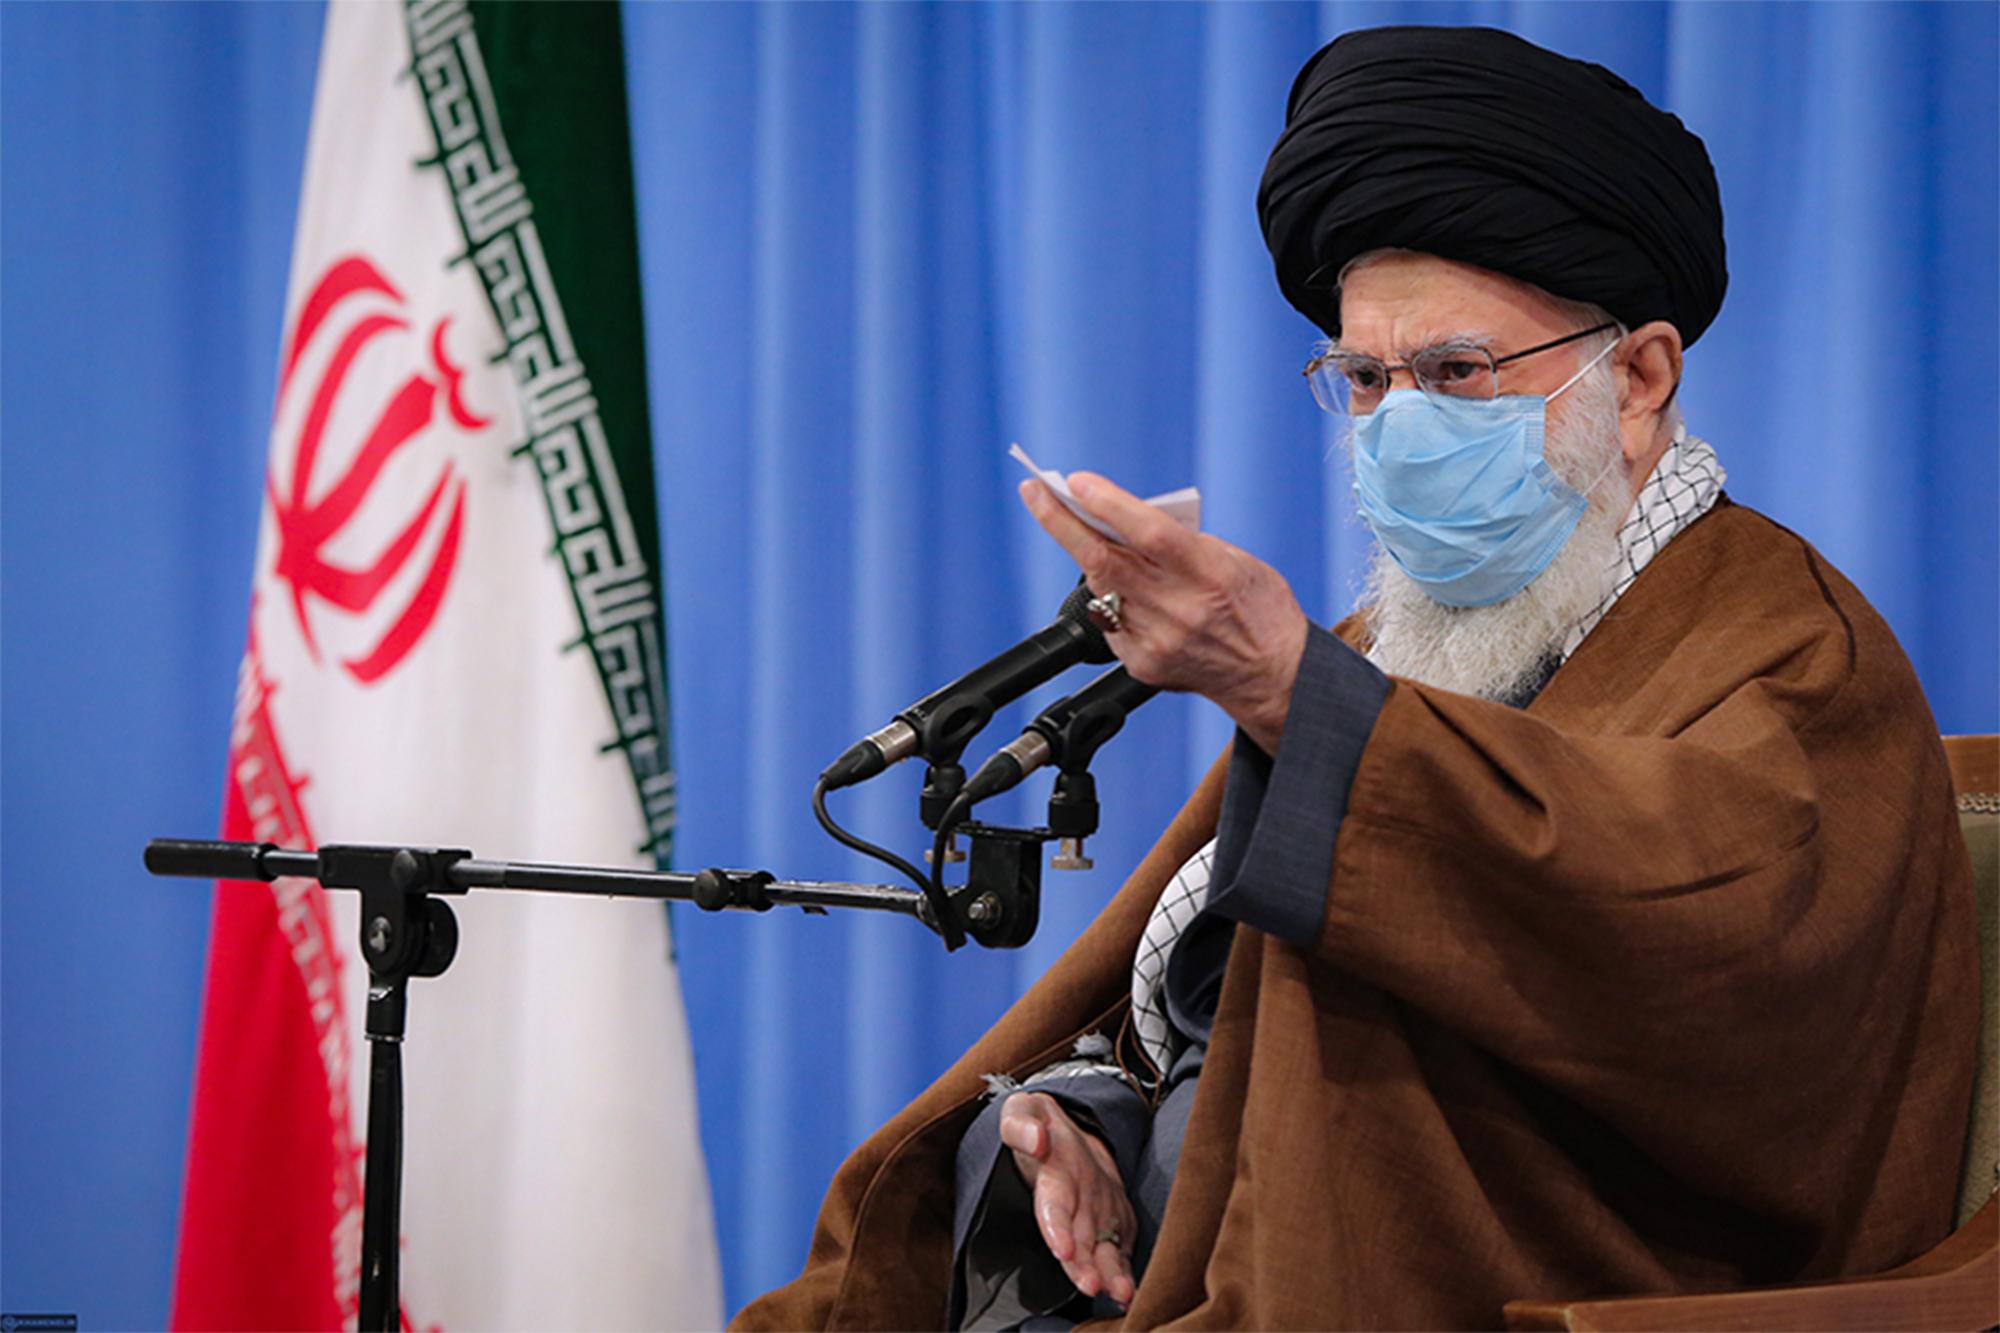 Iran's supreme leader vows revenge over slain nuclear scientist